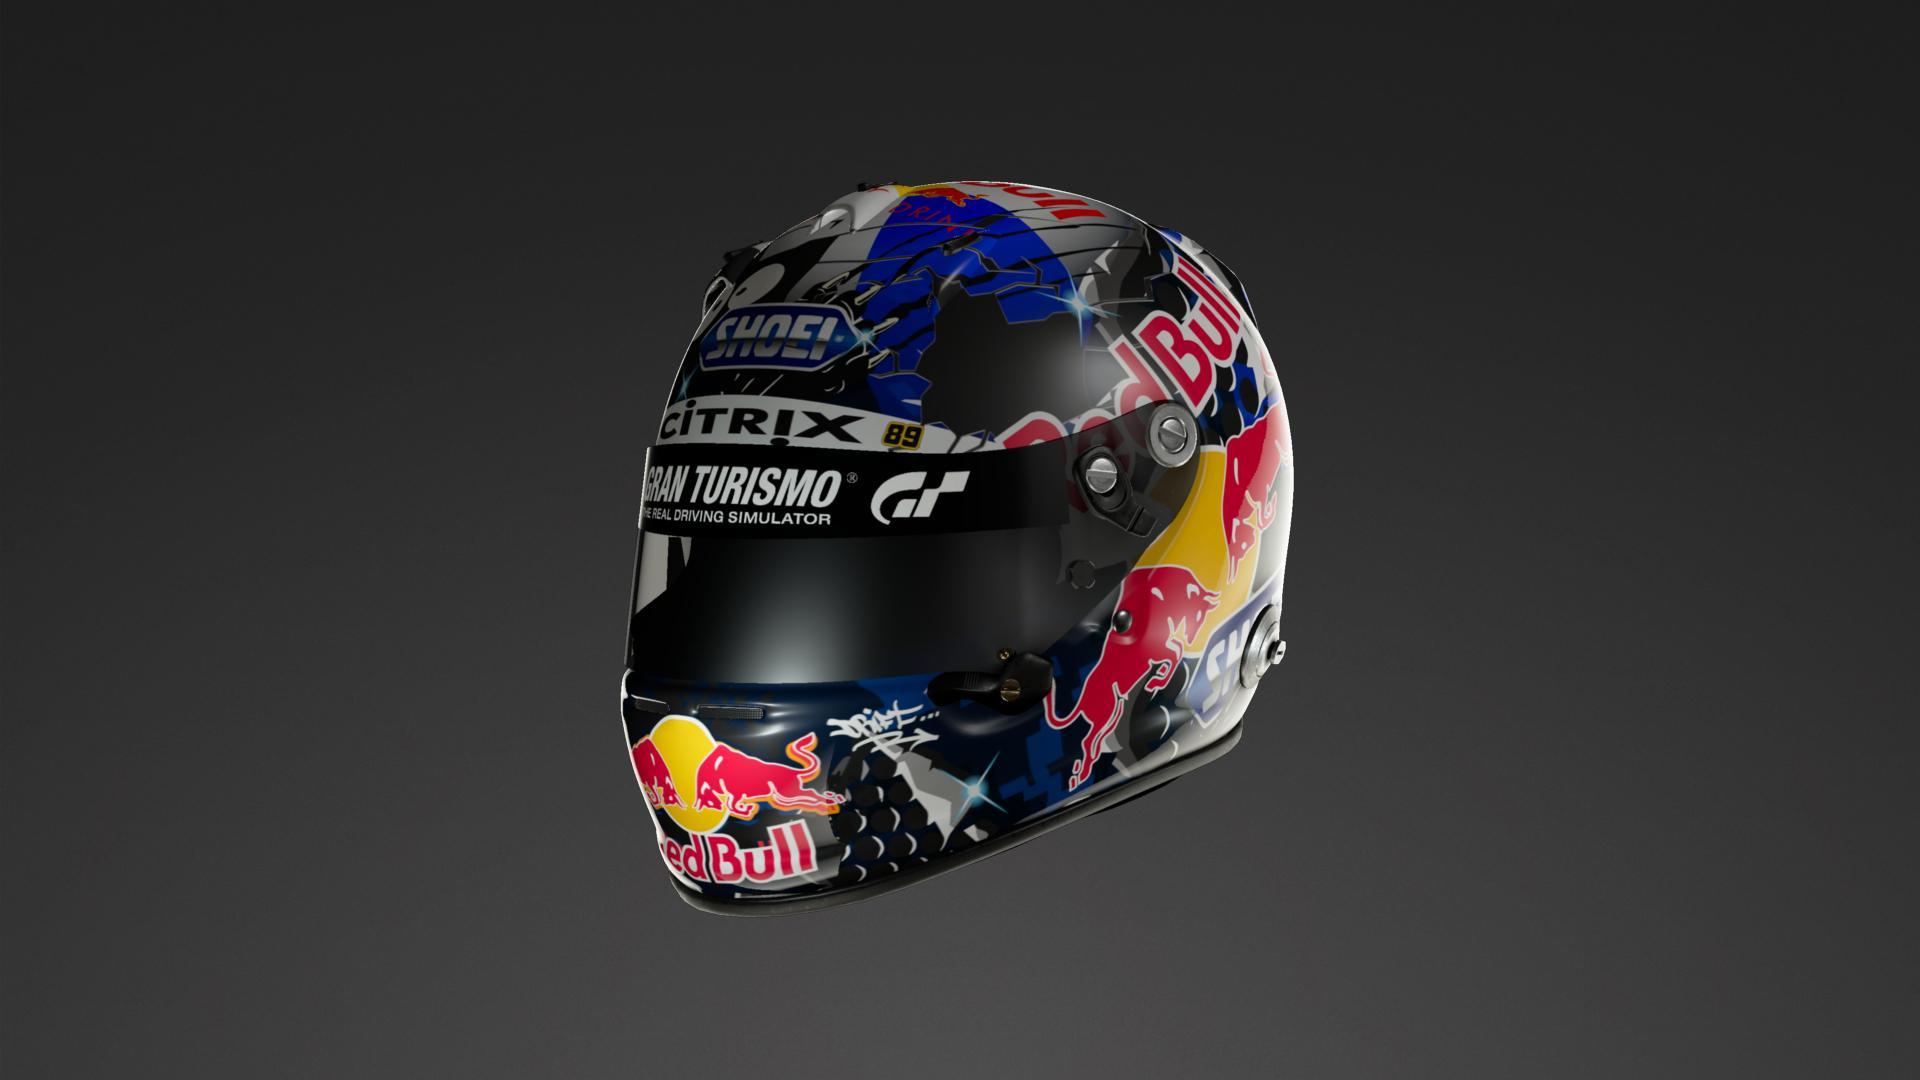 d1cf160ba Red bull helmet livery community gran turismo sport jpg 1920x1080 Bull  helmet